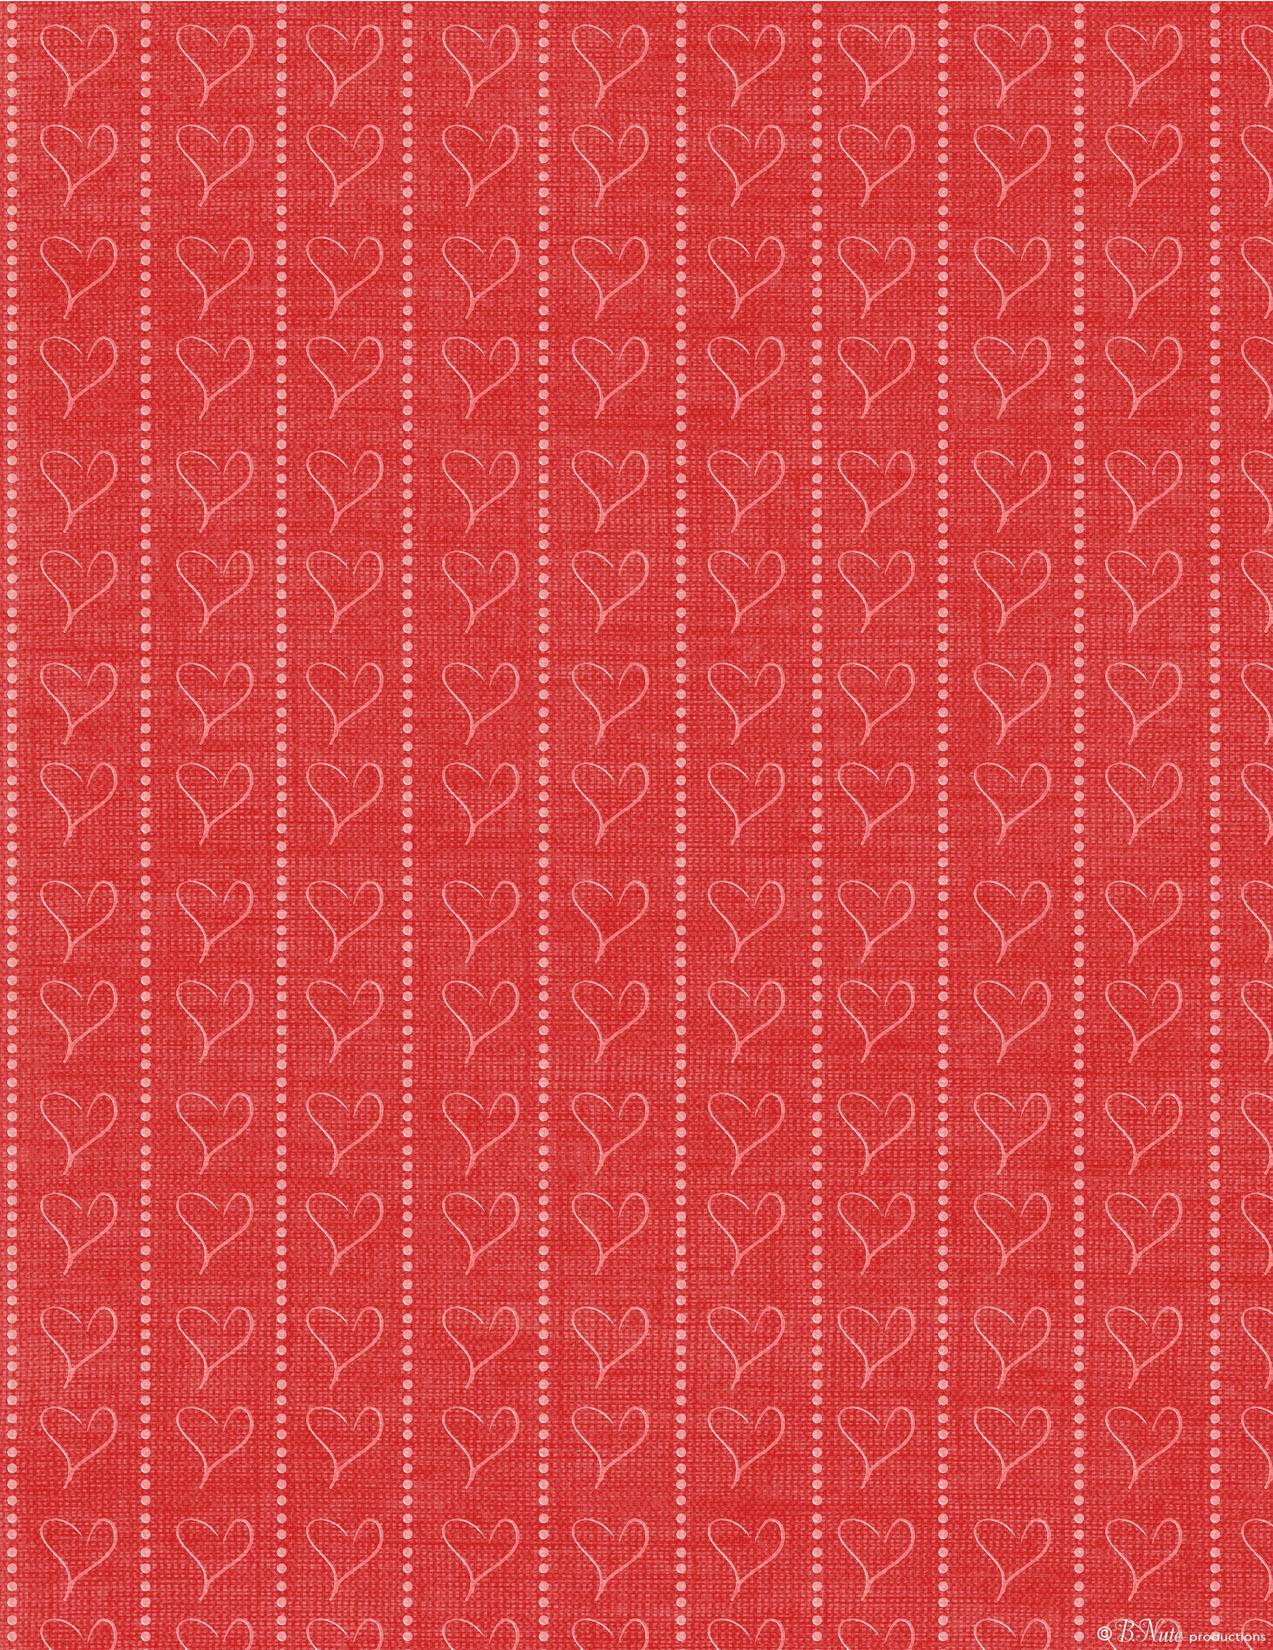 6 Images of Valentine Printable Paper Crafts